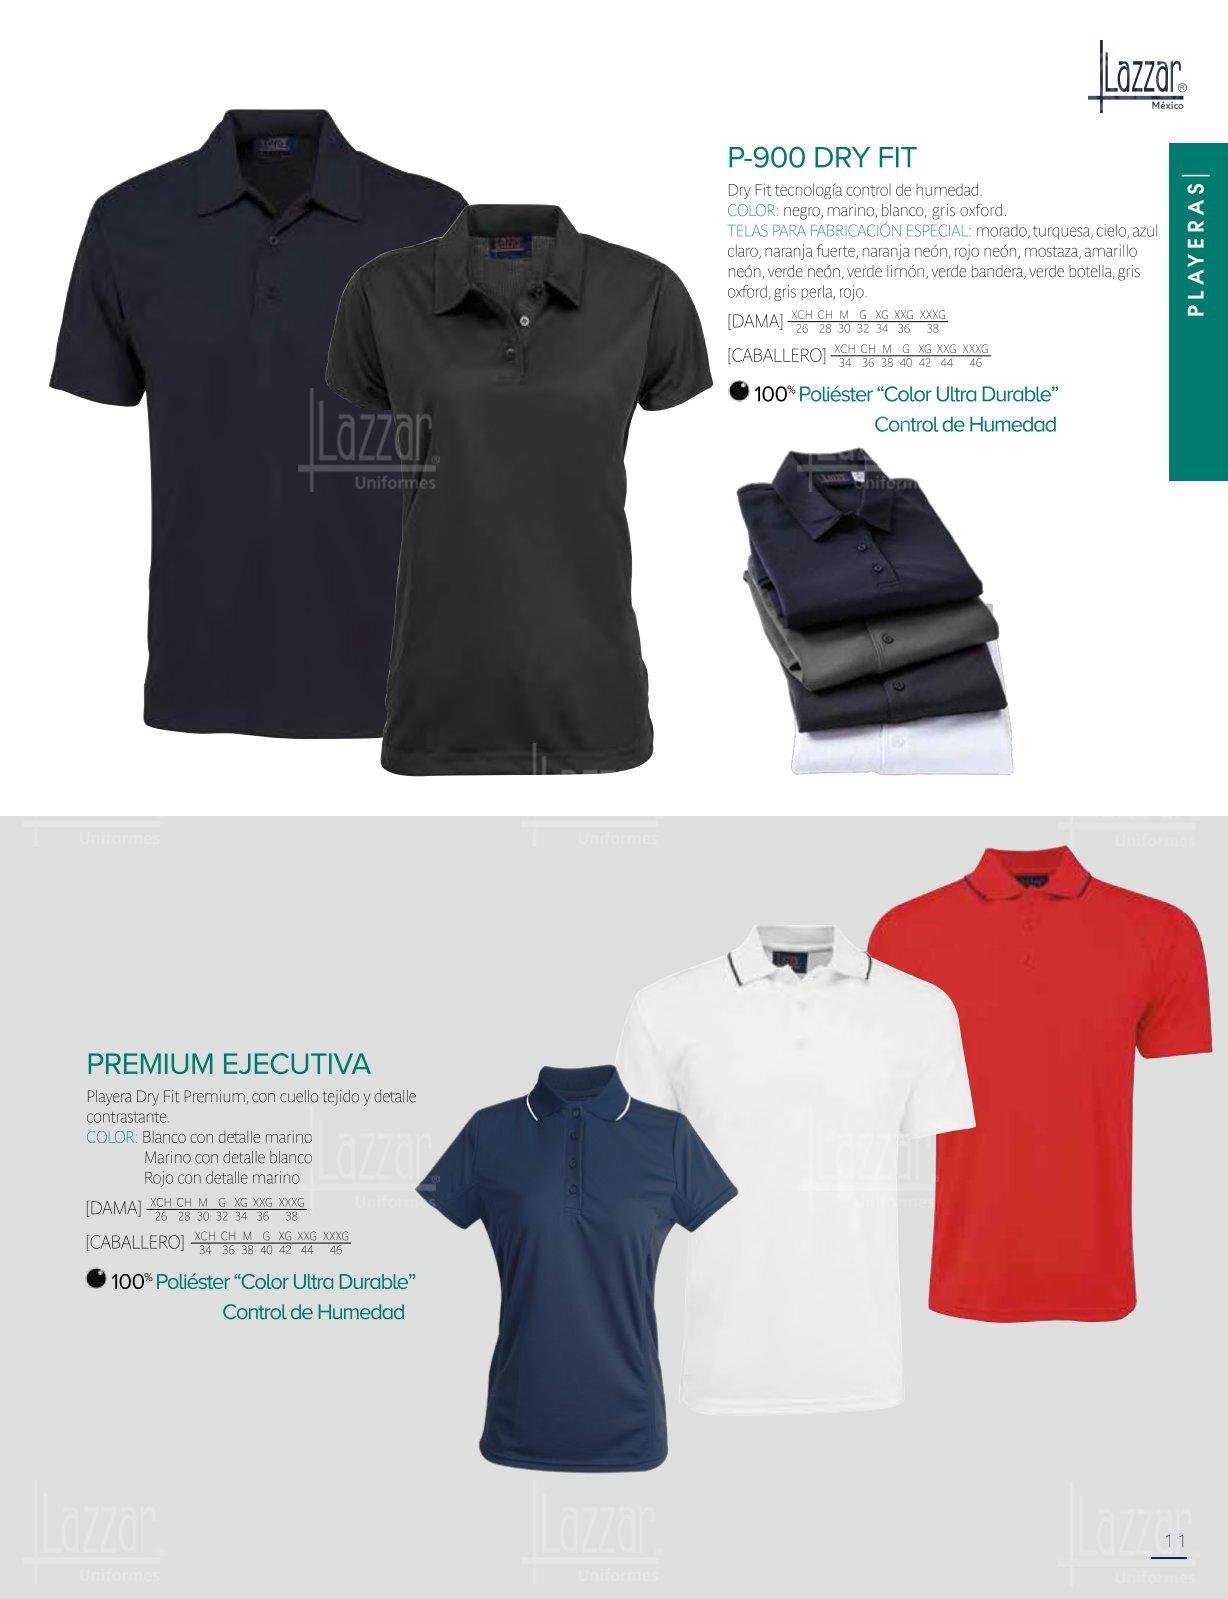 Promo Polo Shirt Nemesis Cream Beige Khaky Light M Update 2018 Bantex Display Book A3 Potrait 20 Pockets Red 3163 09 Https Yumpucom It Document View 60129068 Download Il